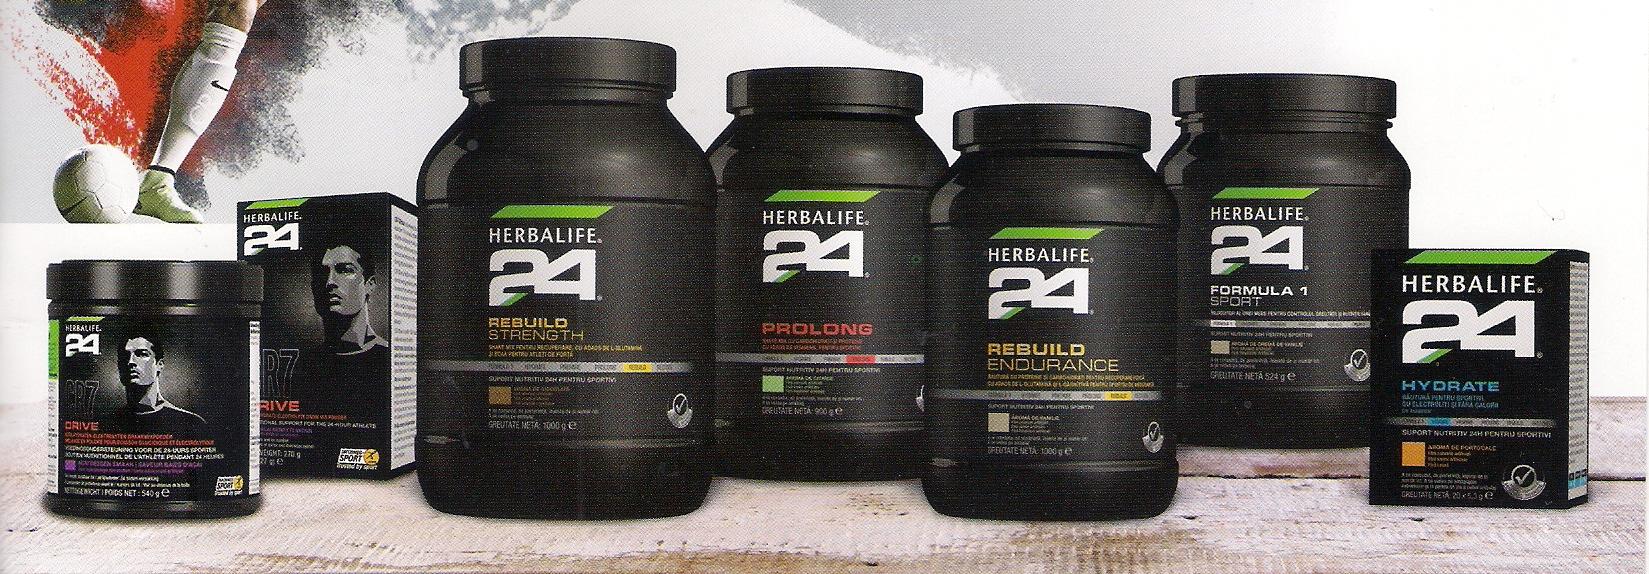 fitness Herbalife H24